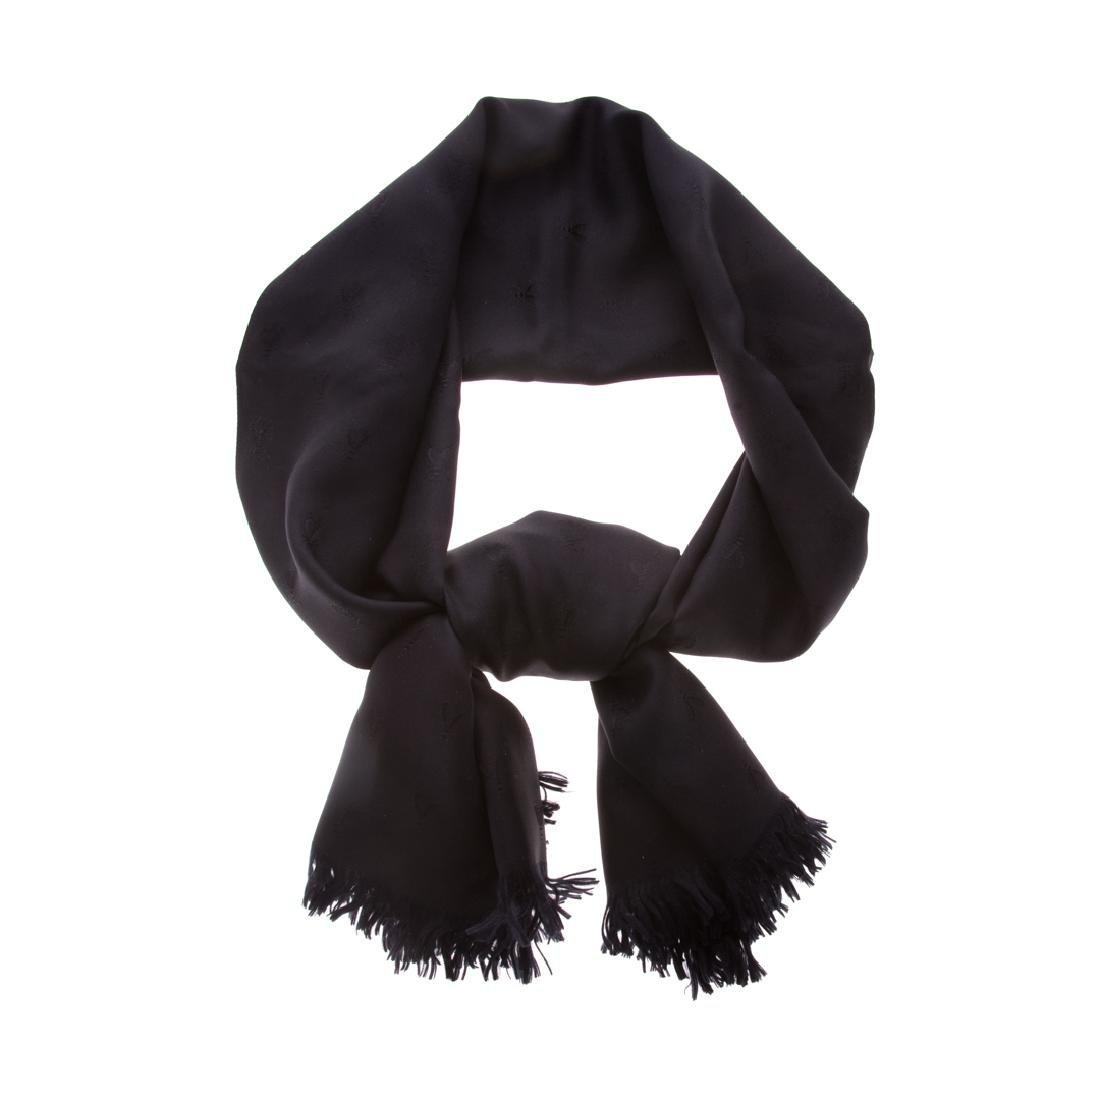 A Hermès Black Tonal Insect Scarf